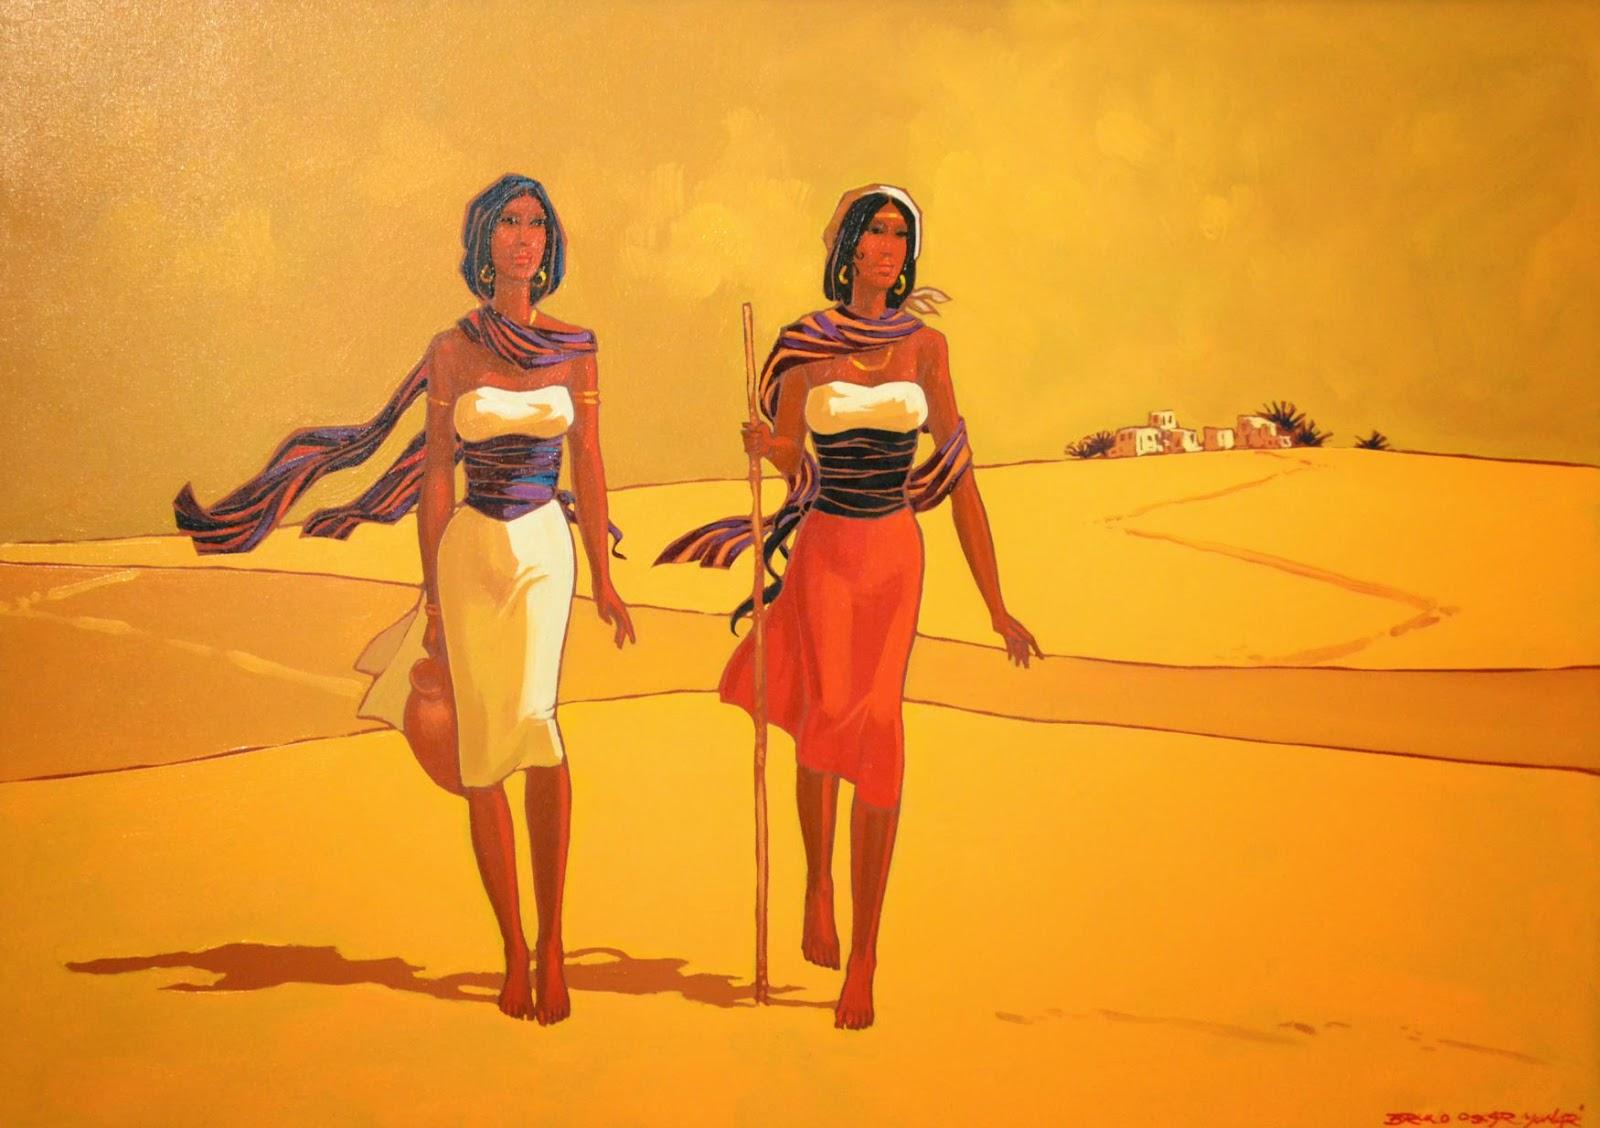 Conosciuto VERSI IN VOLO: Galleria d'arte: Bruno Oscar Munari DP32